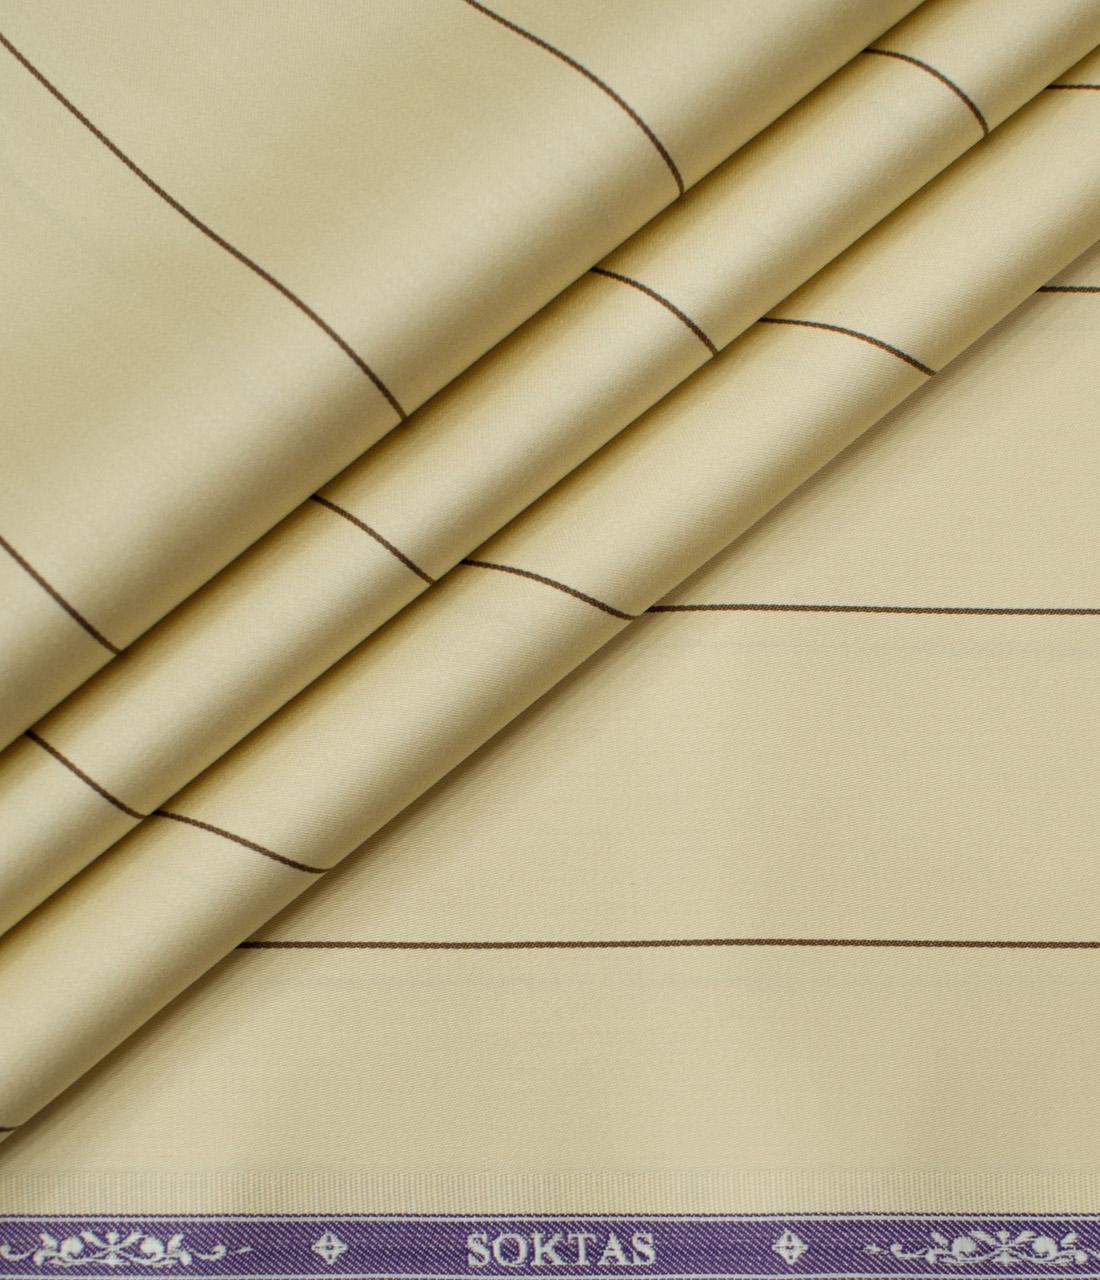 Soktas Men's Giza Cotton Striped Unstitched Shirting Fabric (Daffodil Yellow)